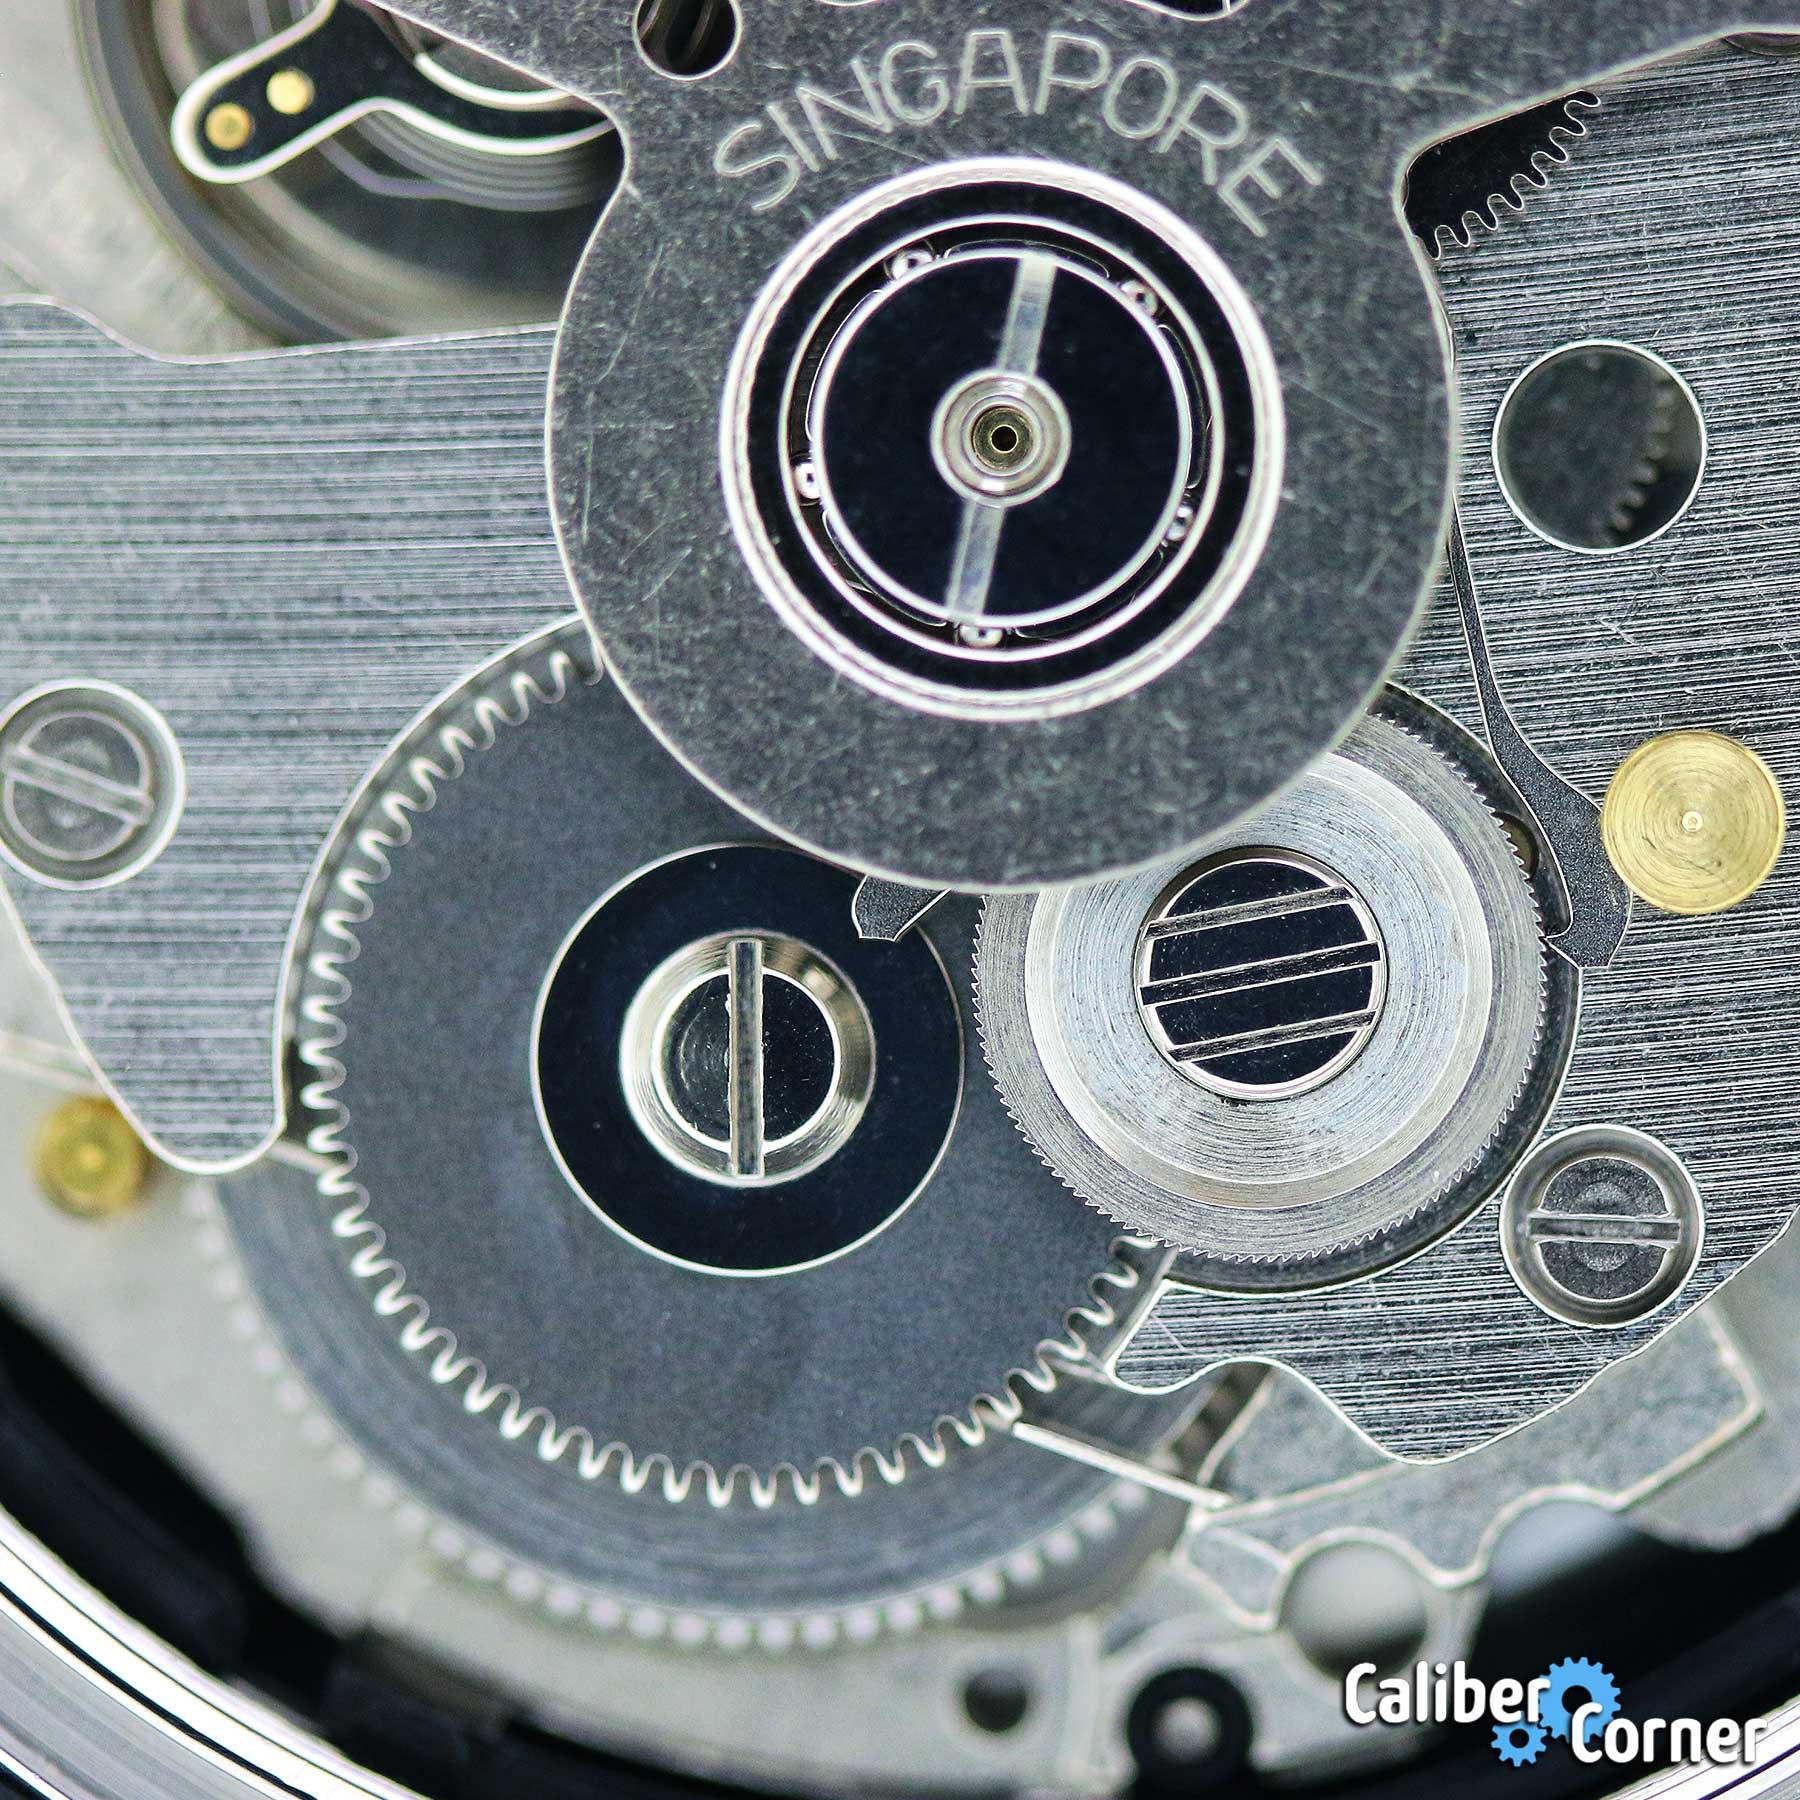 Seiko Caliber 7s26a Macro Gears